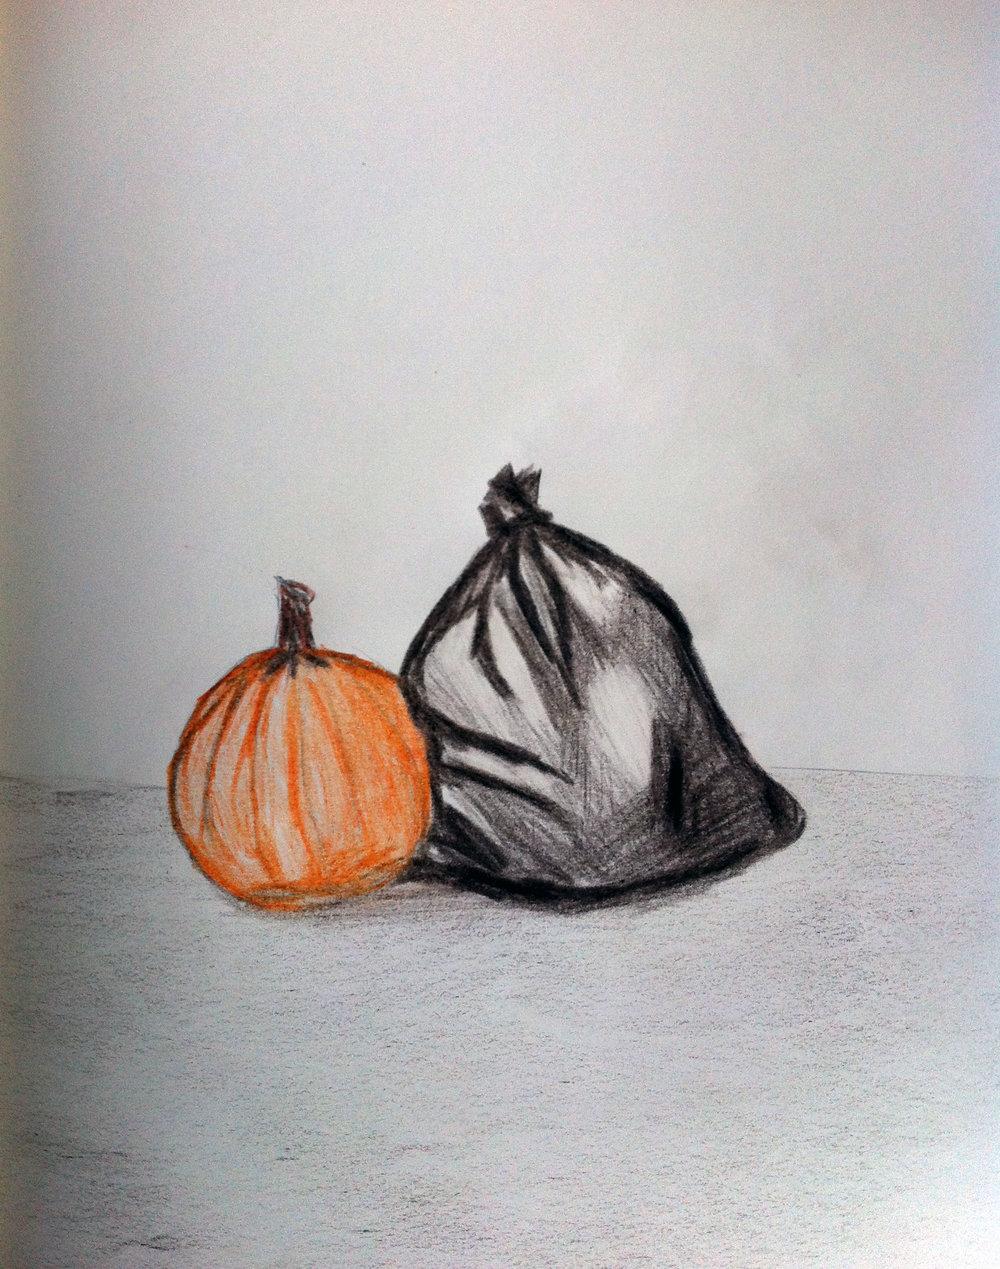 pumpkin&bag.jpg